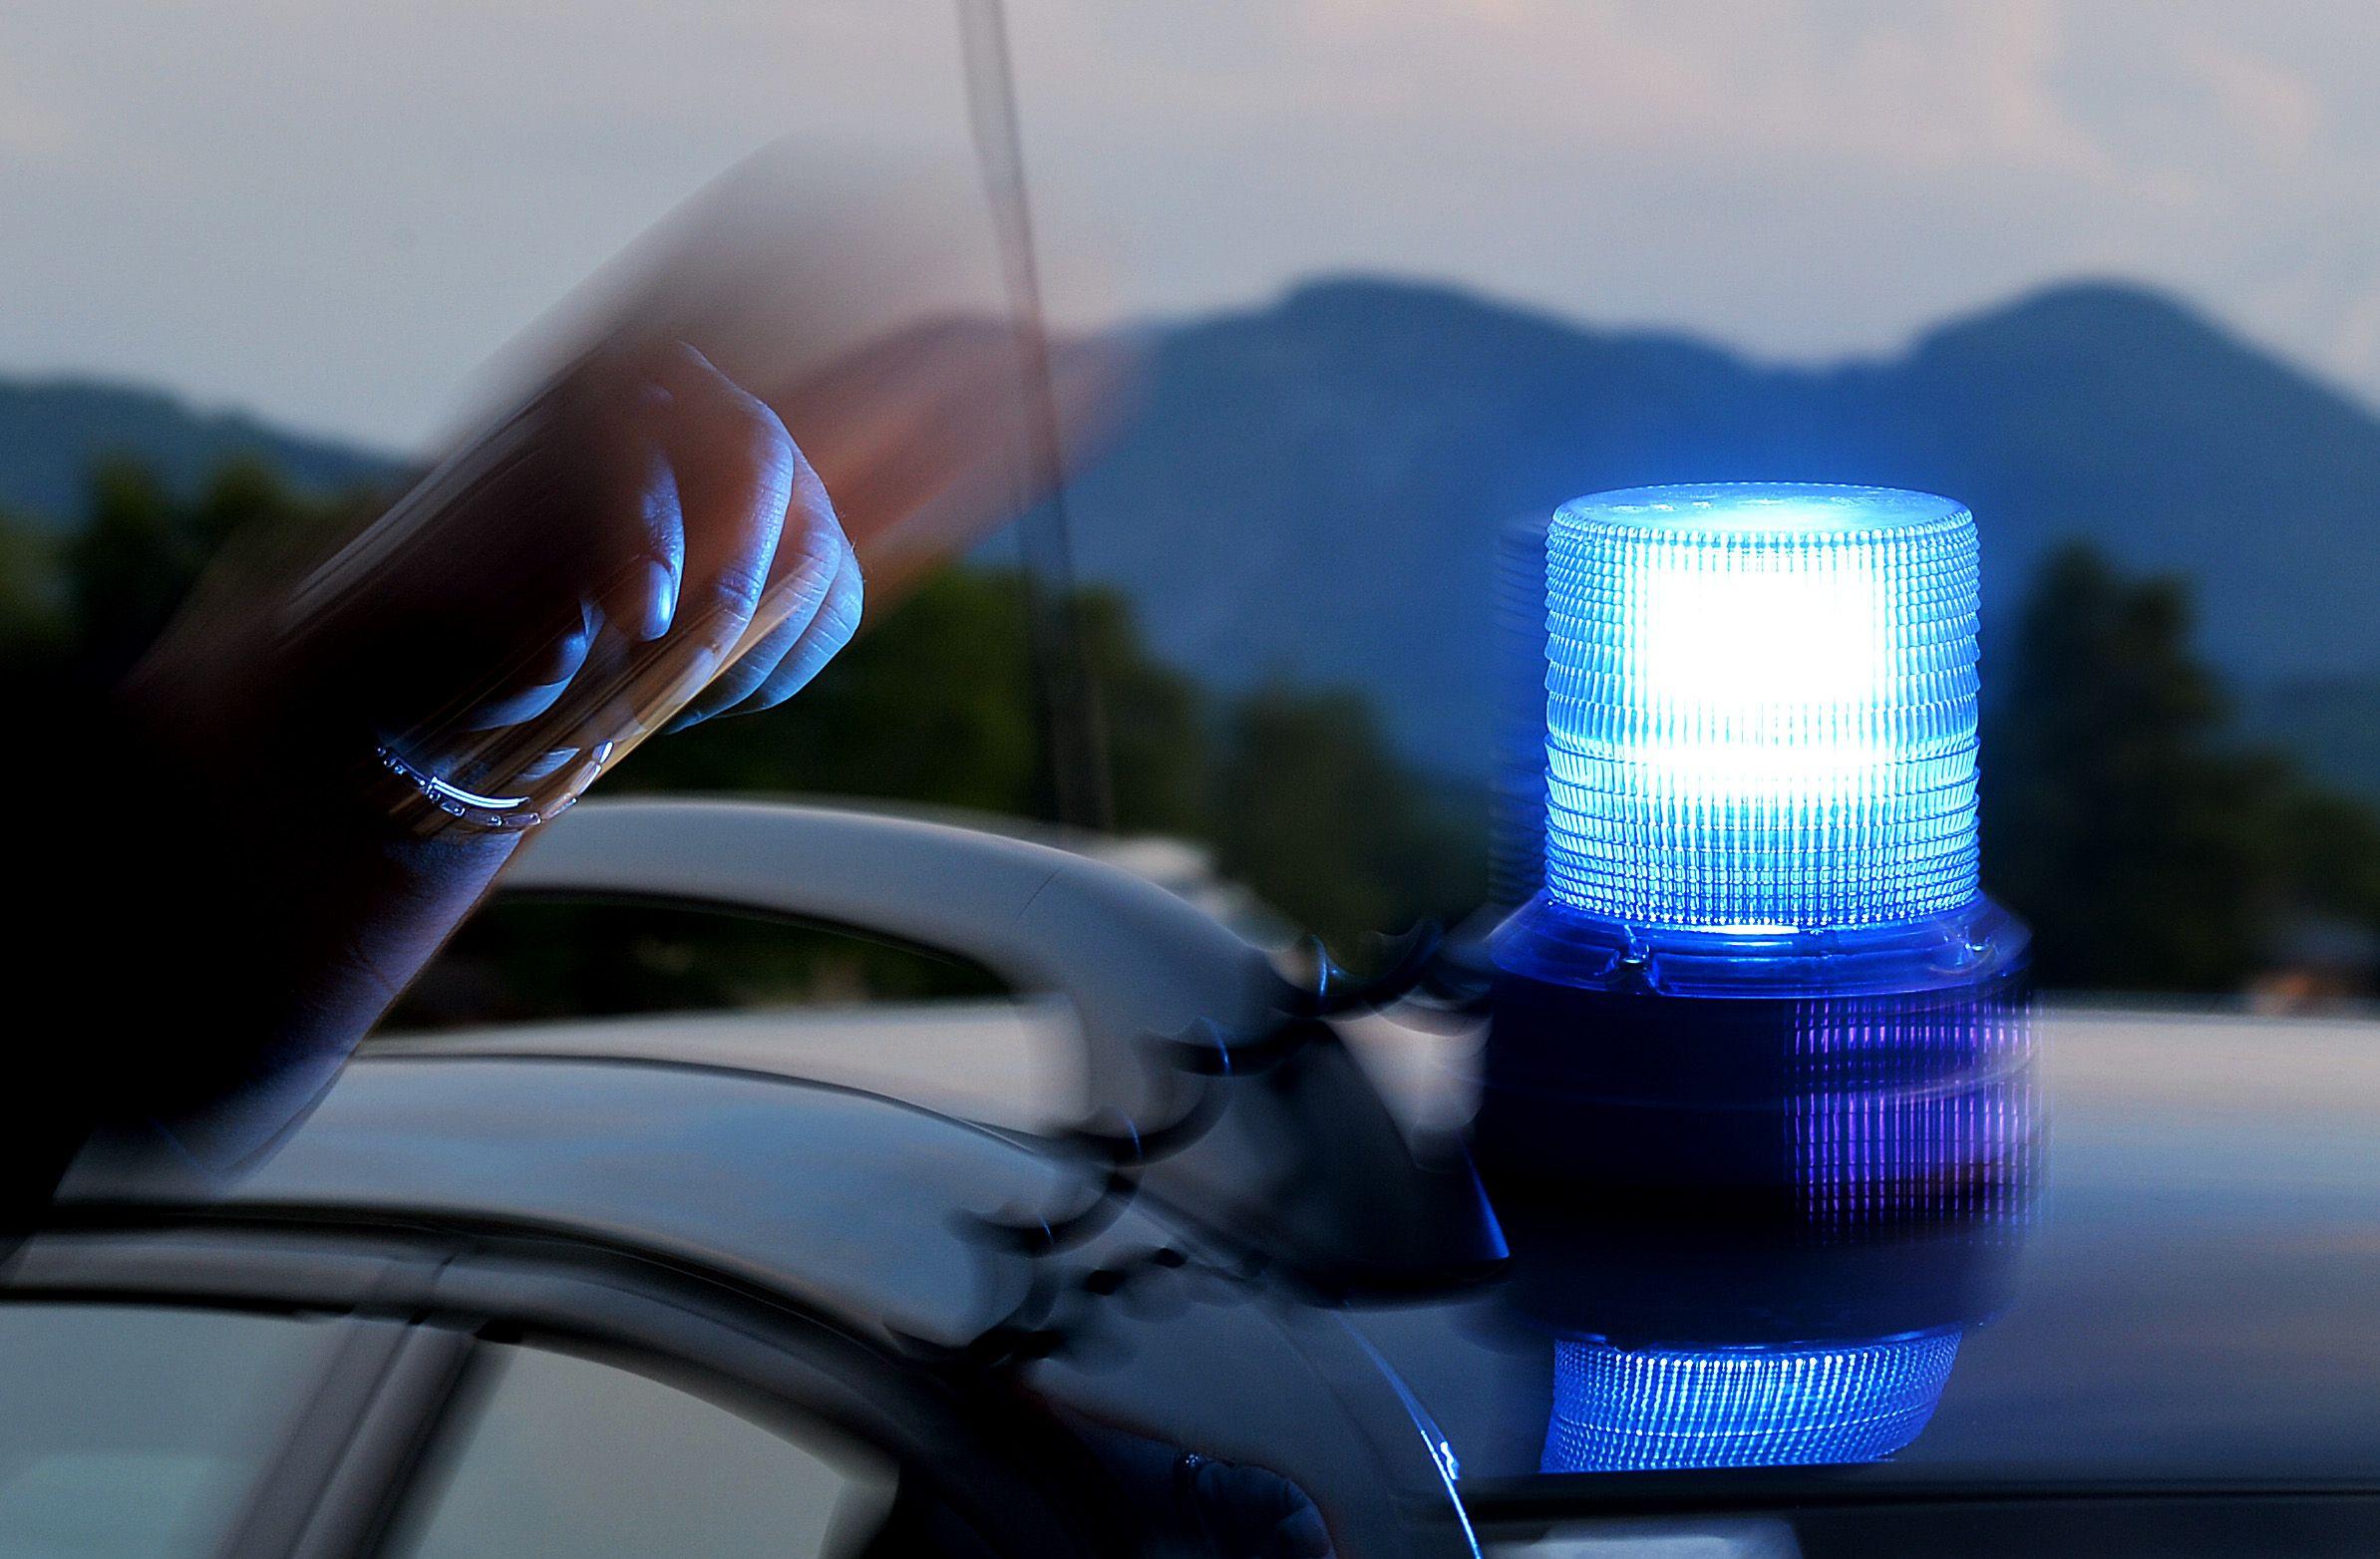 Vorarlberg: 15-Jähriger bei Unfall verletzt - Fahrerflucht